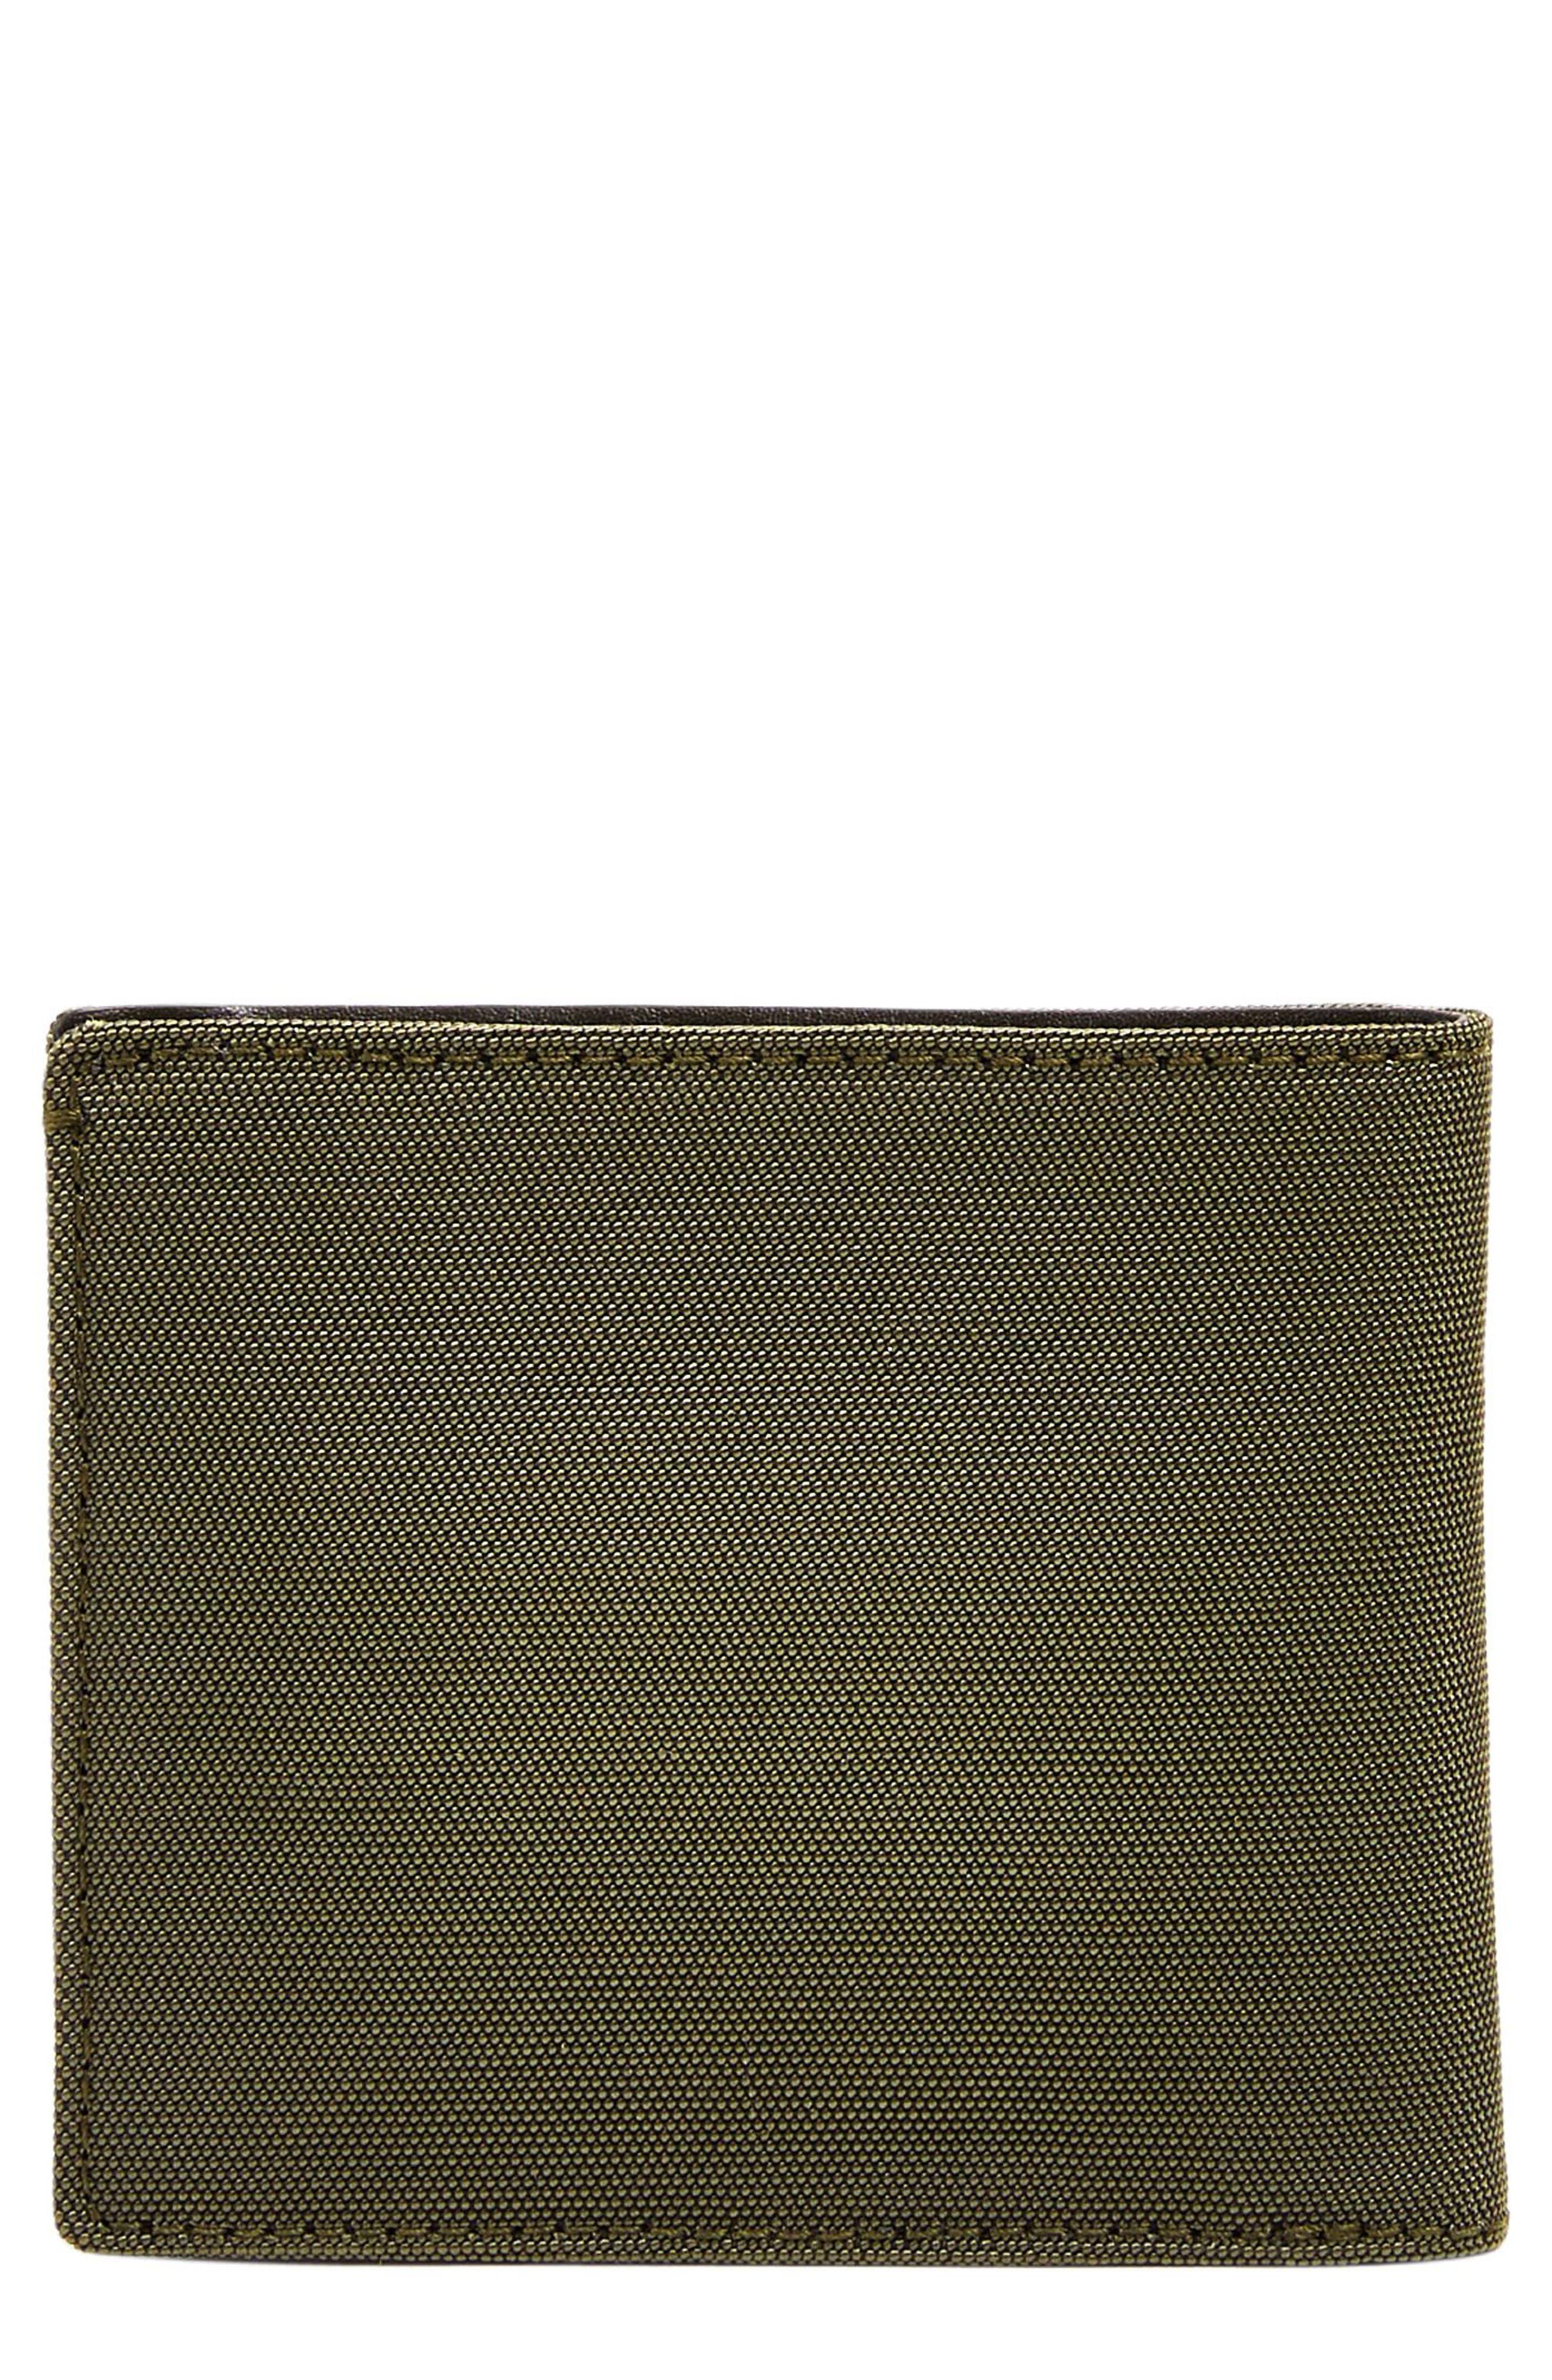 SKAGEN Passcase Wallet